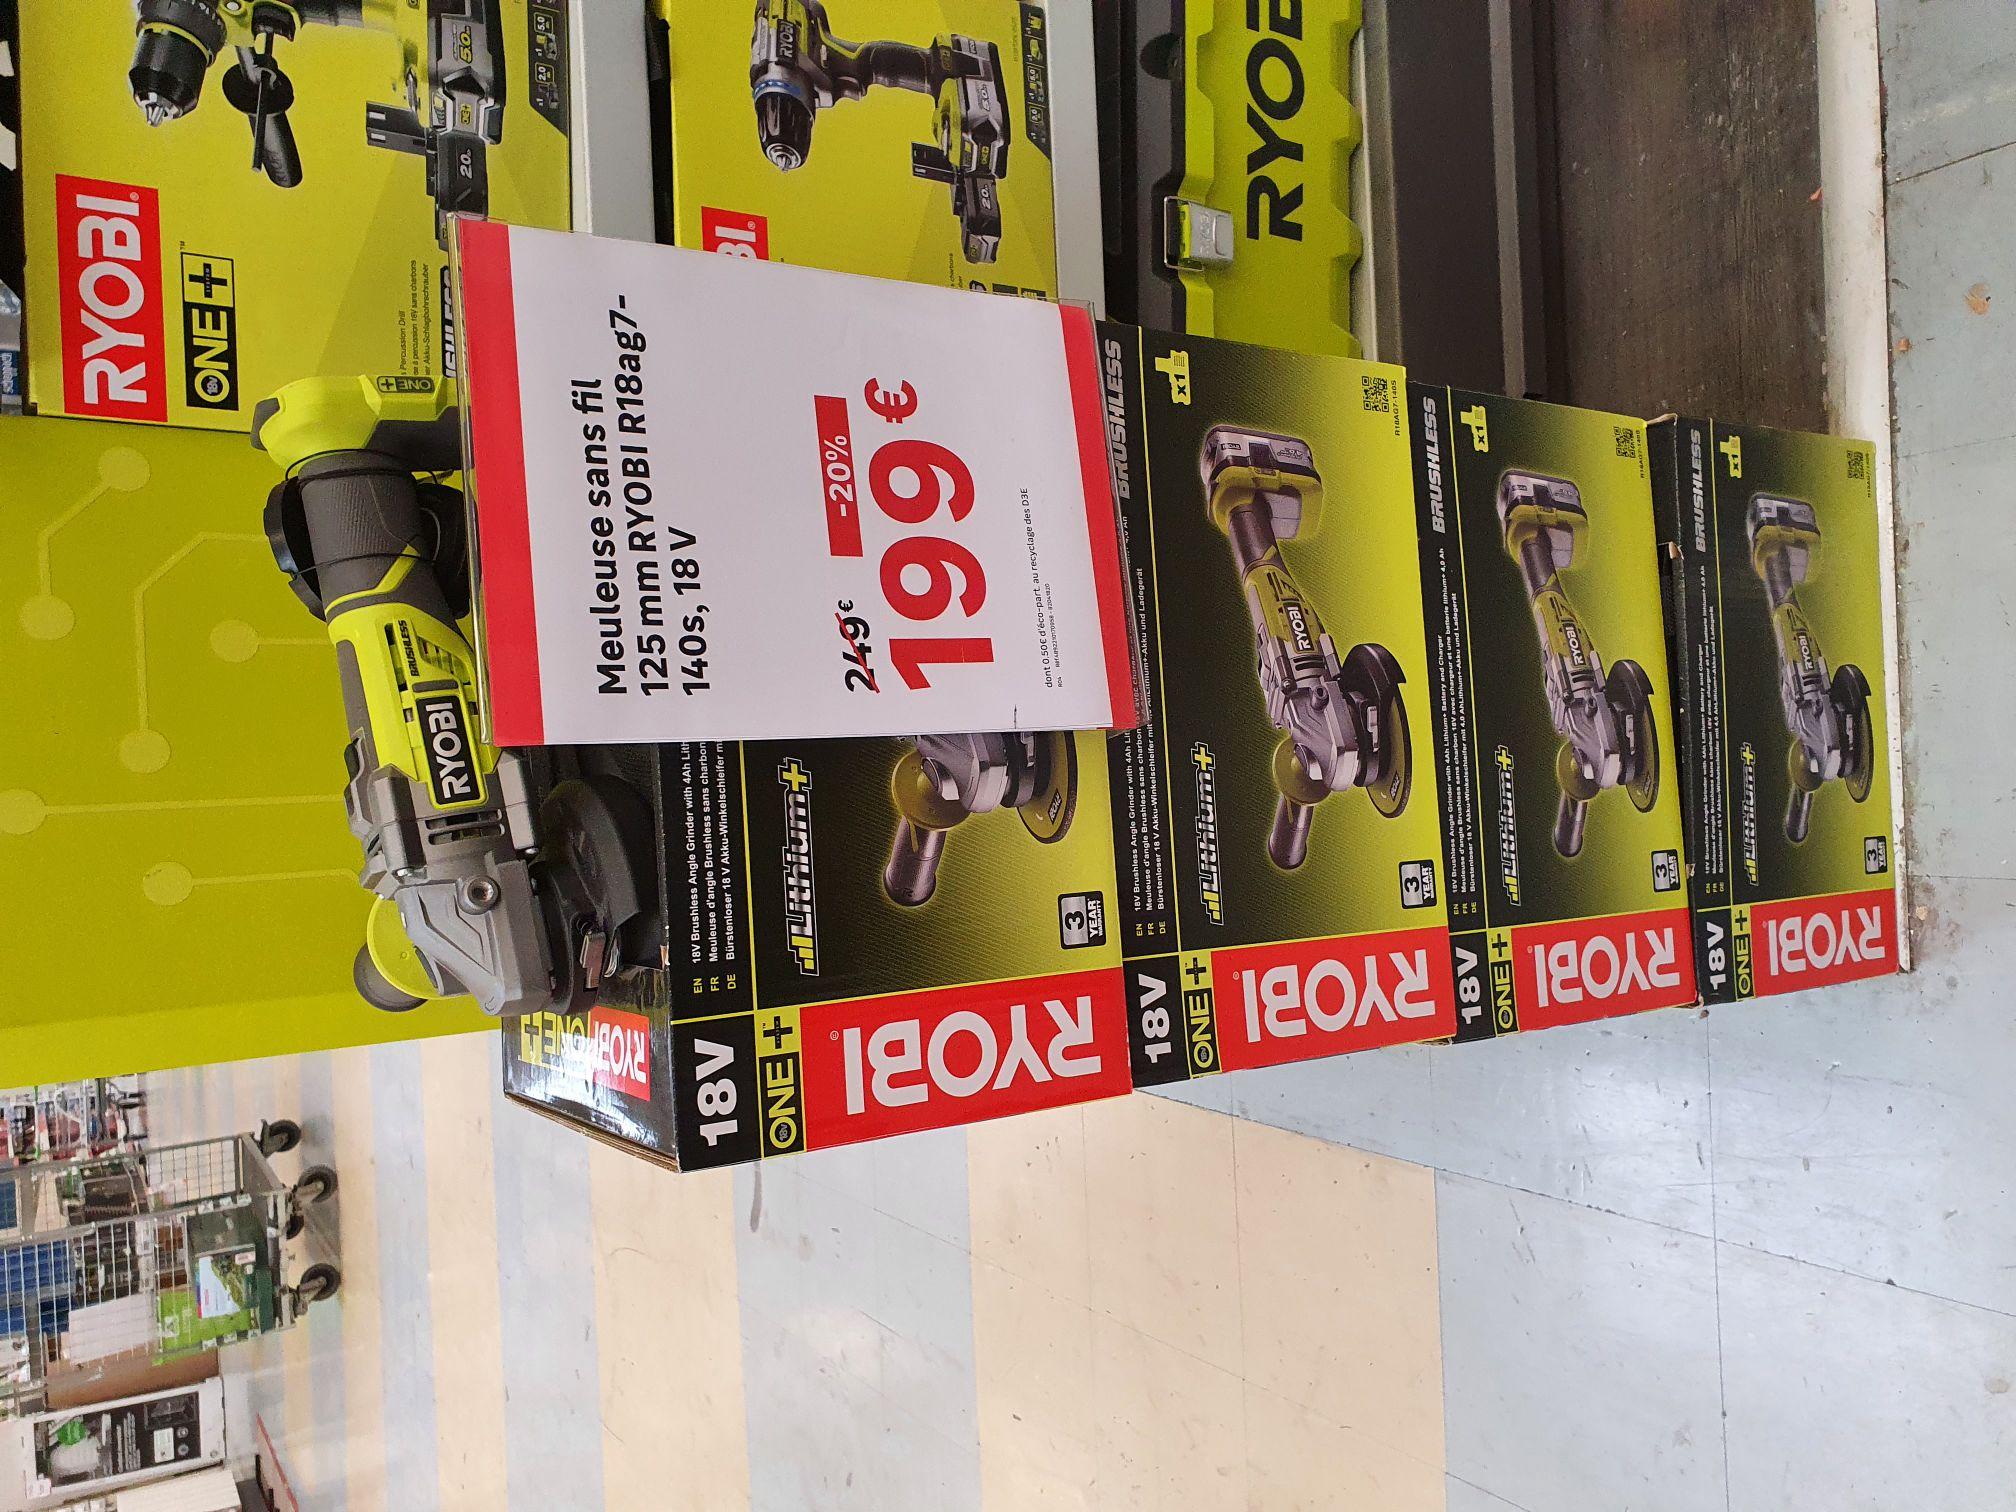 Pack meuleuse Ryobi Brushless R18AG7-140S avec Batterie 4Ah, chargeur & outil multifonctions R18MT3-0 (via ODR) - St Jean de Vedas (34)